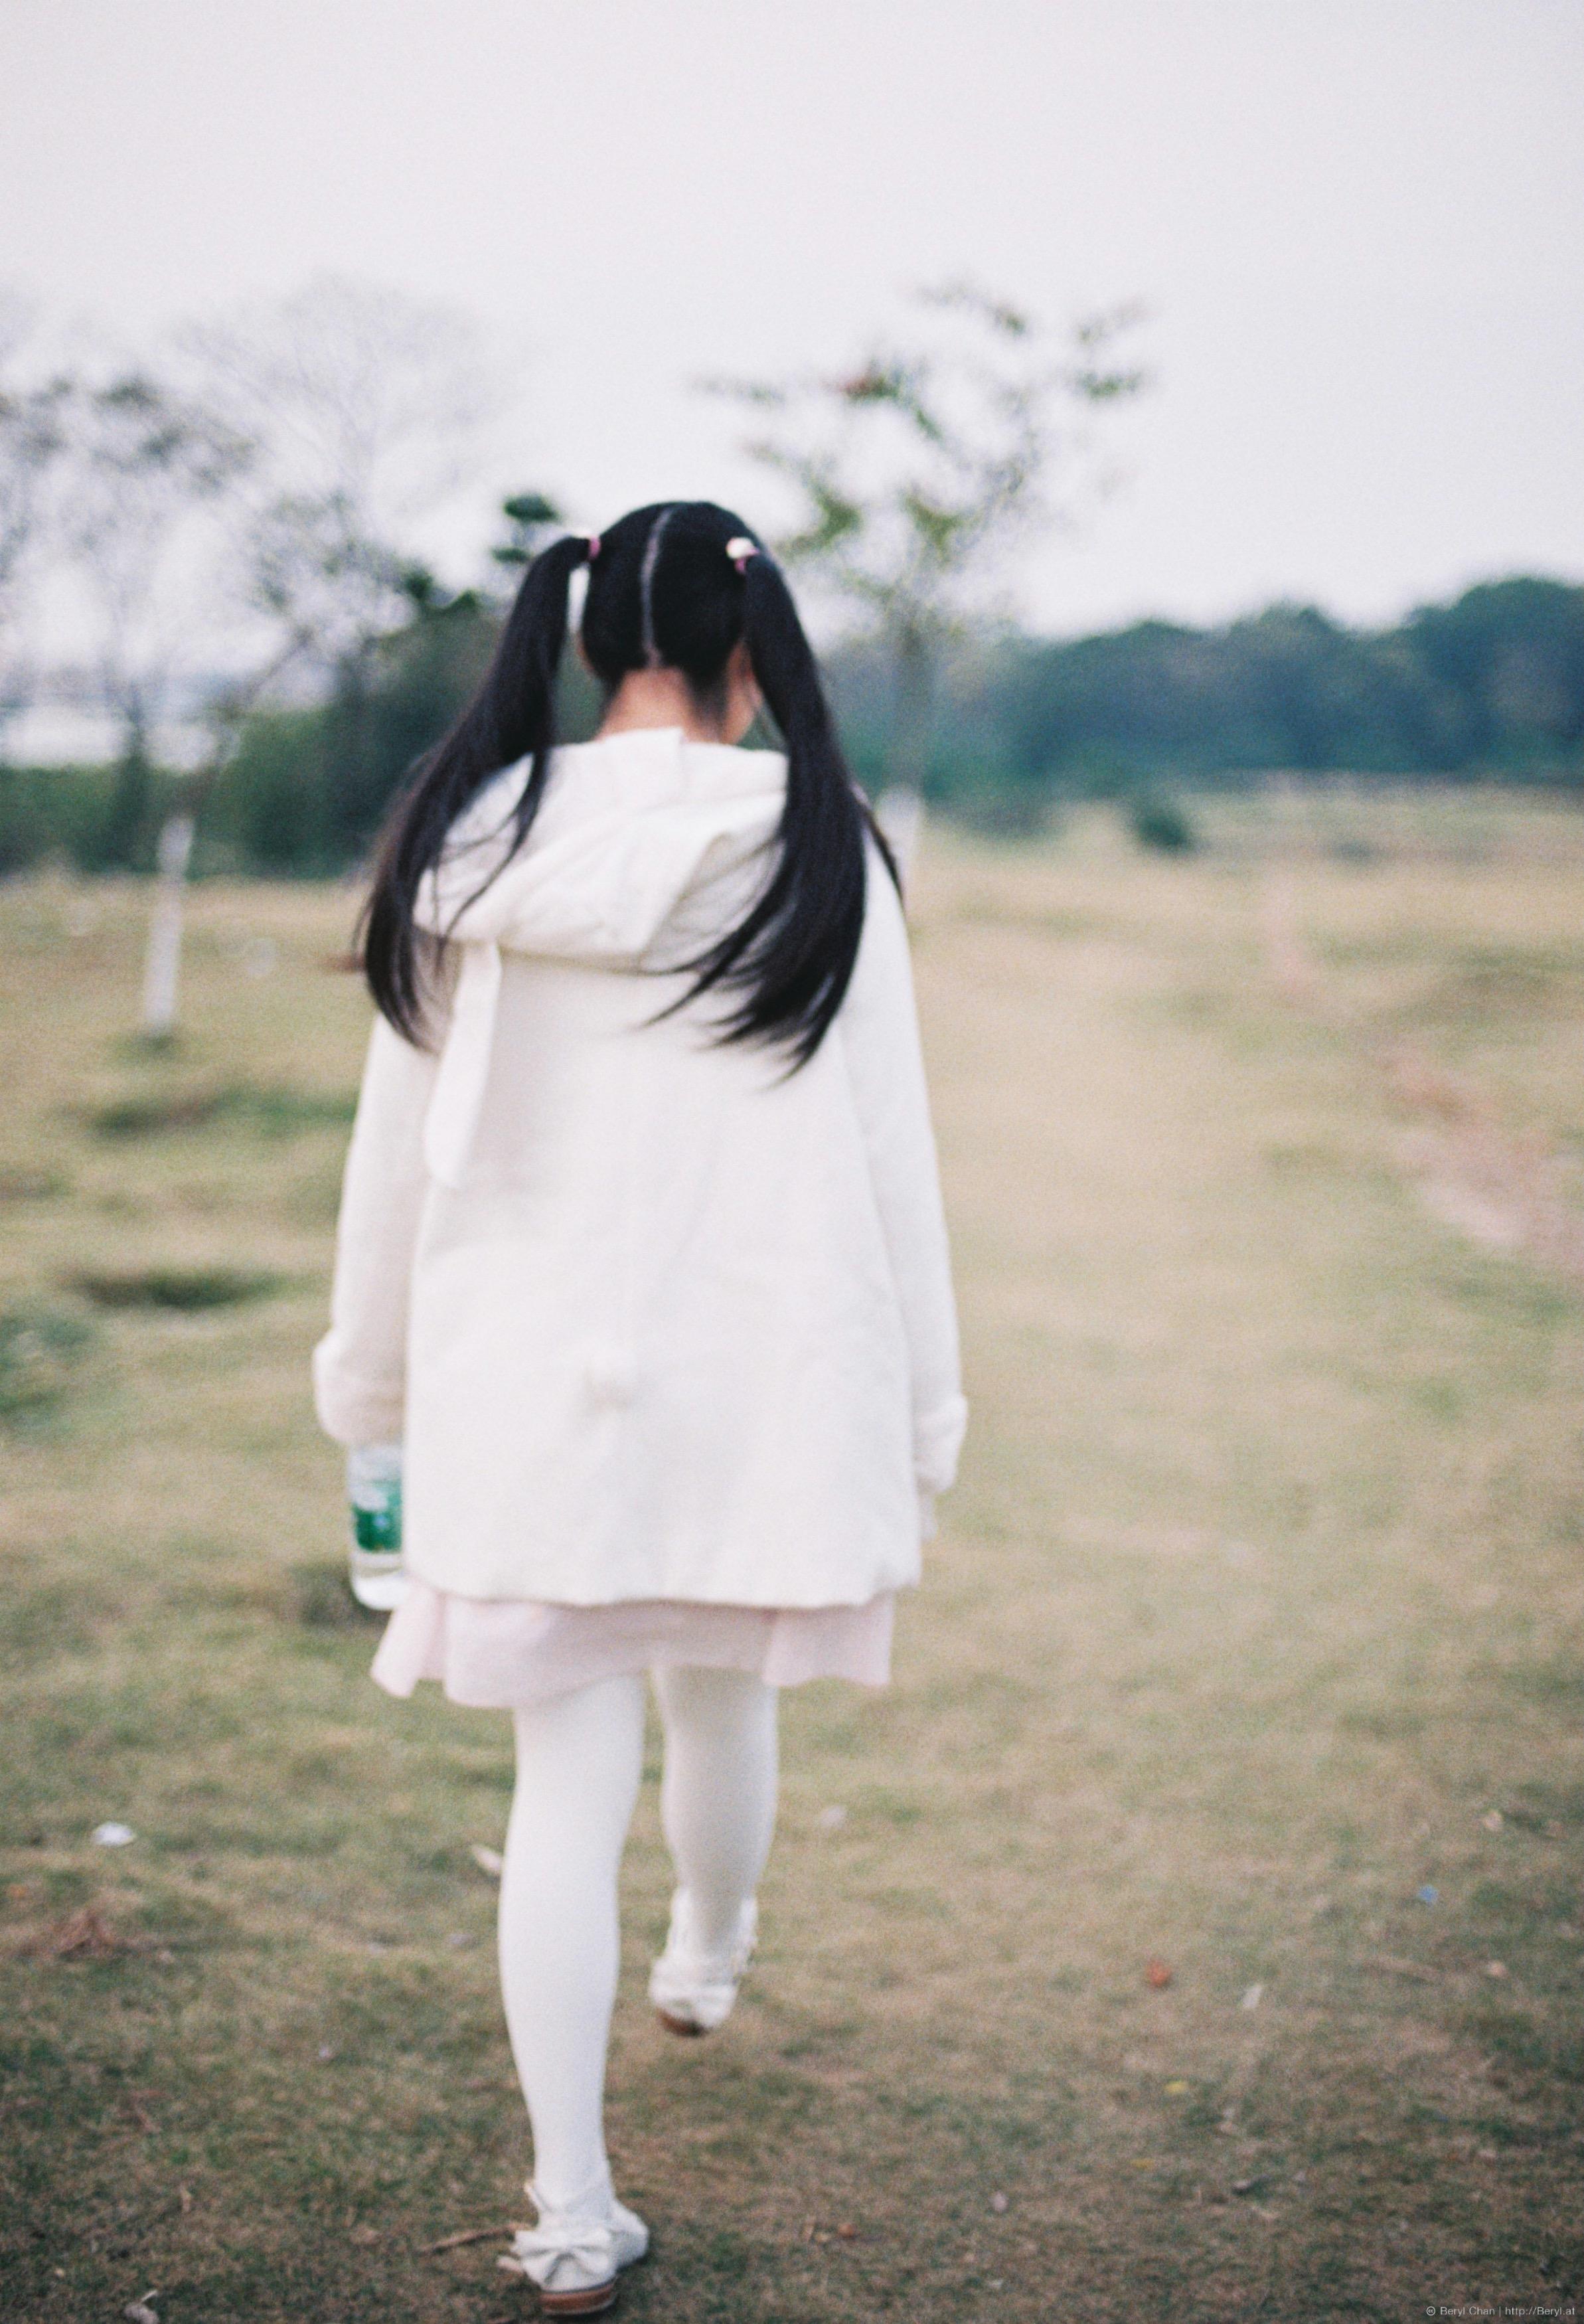 Gambar gadis wanita putih imut film analog kaki bersih mode nikon gaun pengantin pengantin laki laki sepatu upacara terang foto